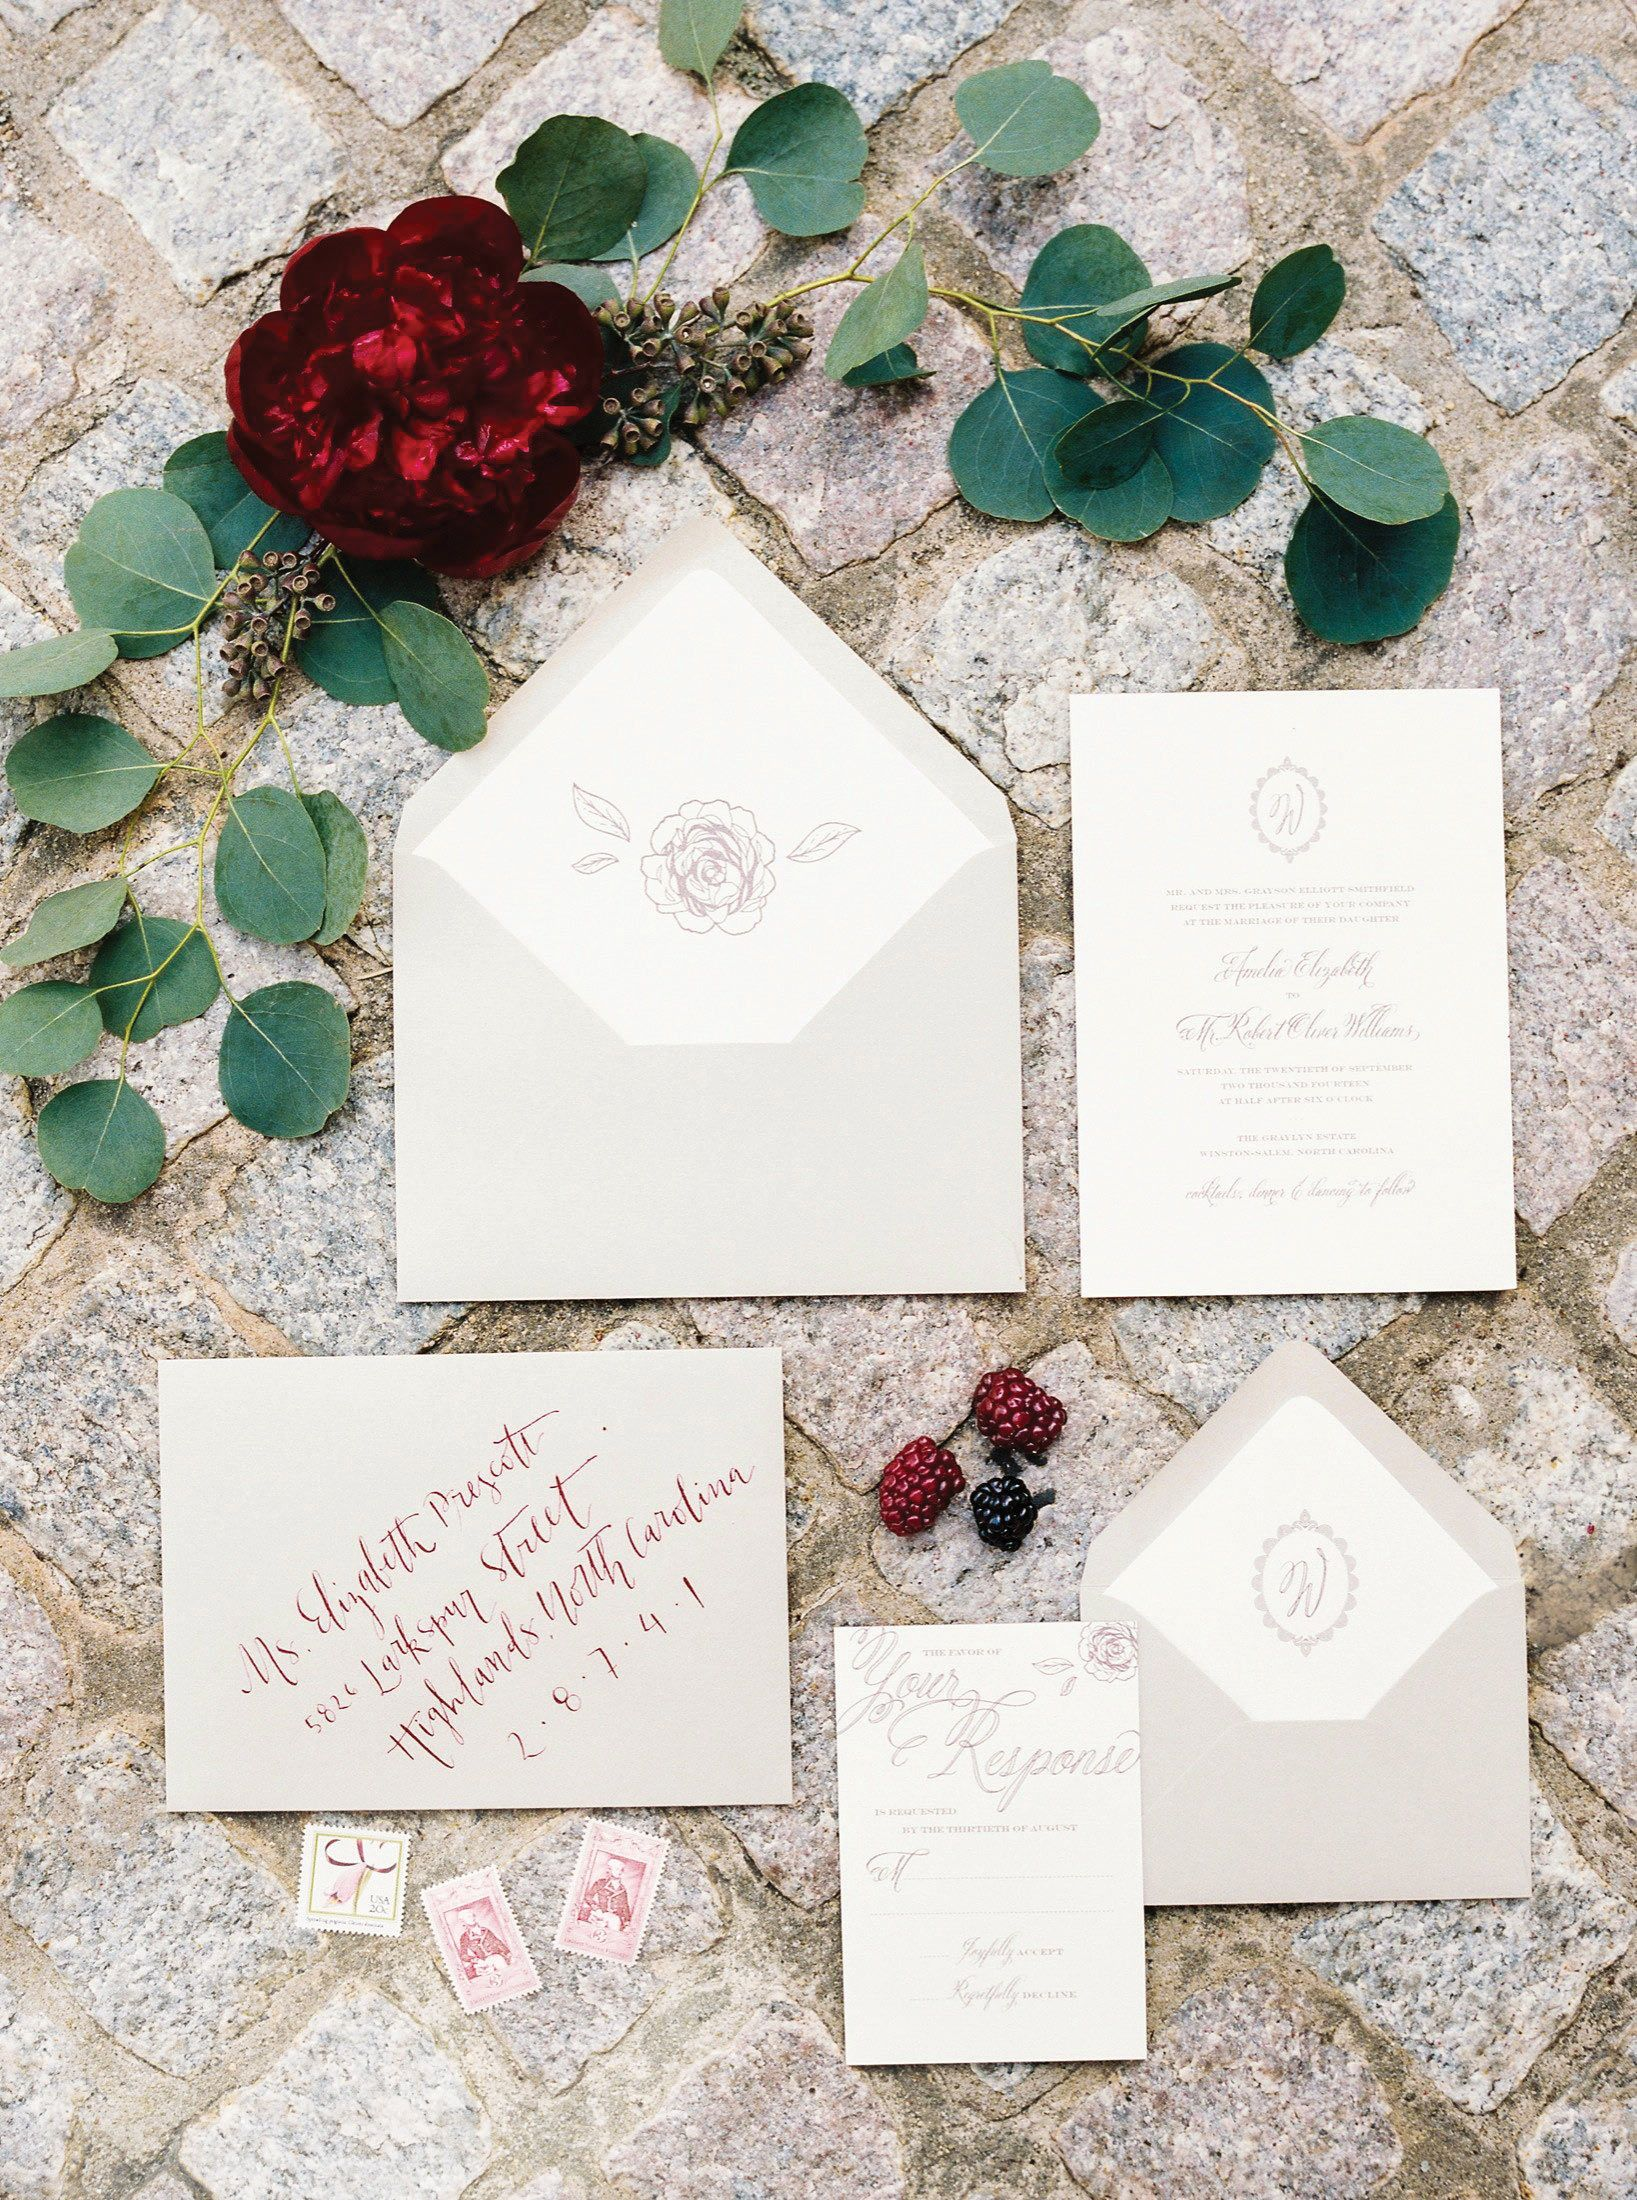 Wedding Inspiration: Old-World Glam Meets Modern Romance | Flat ...